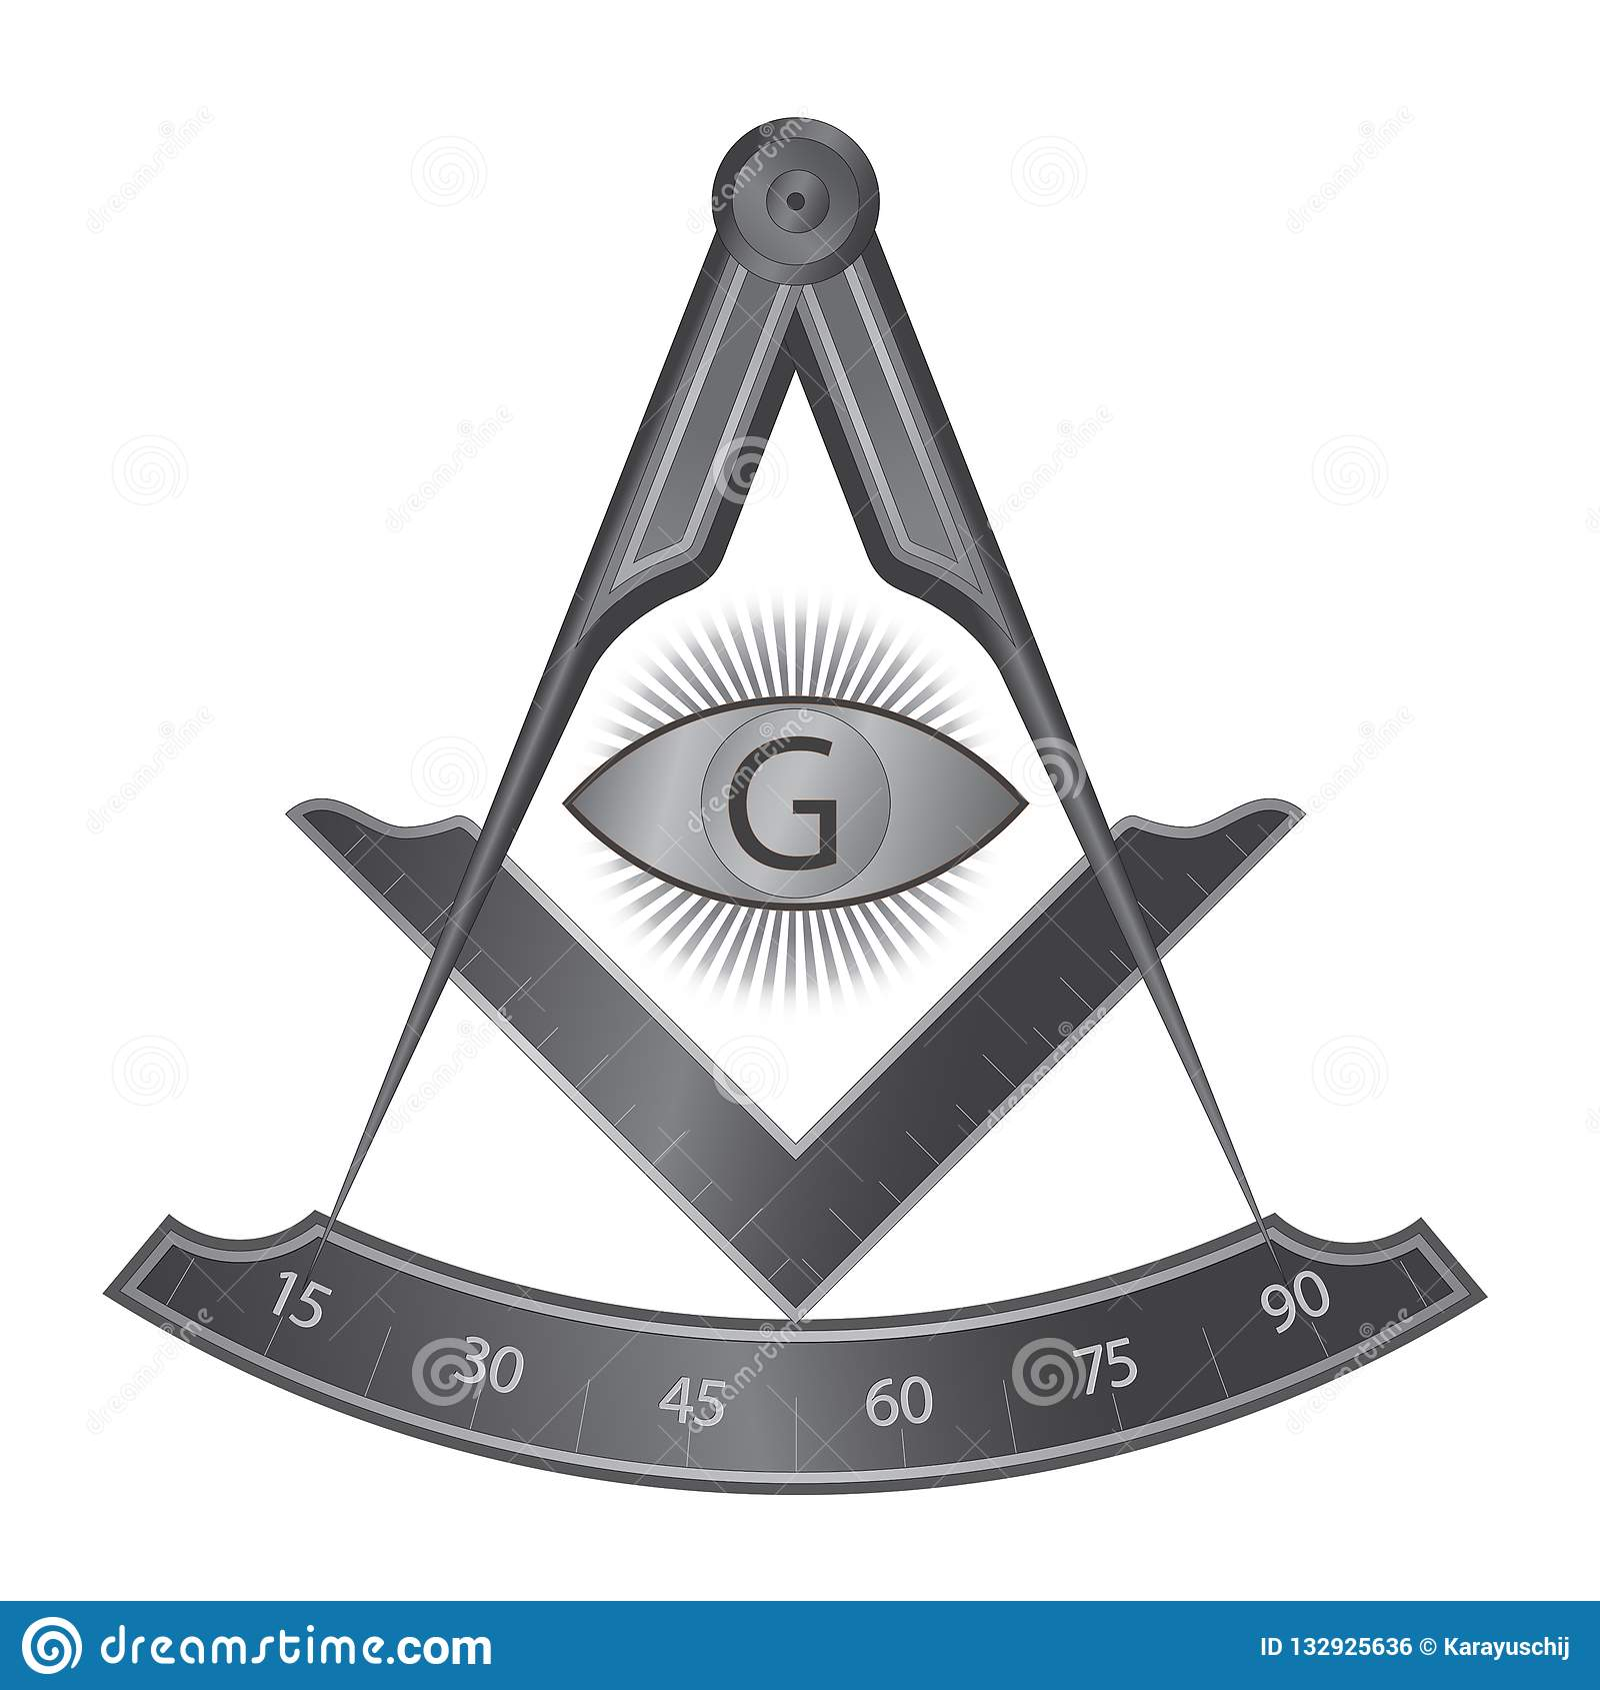 Black Iron Masonic Square And Compass Symbol Stock Vector